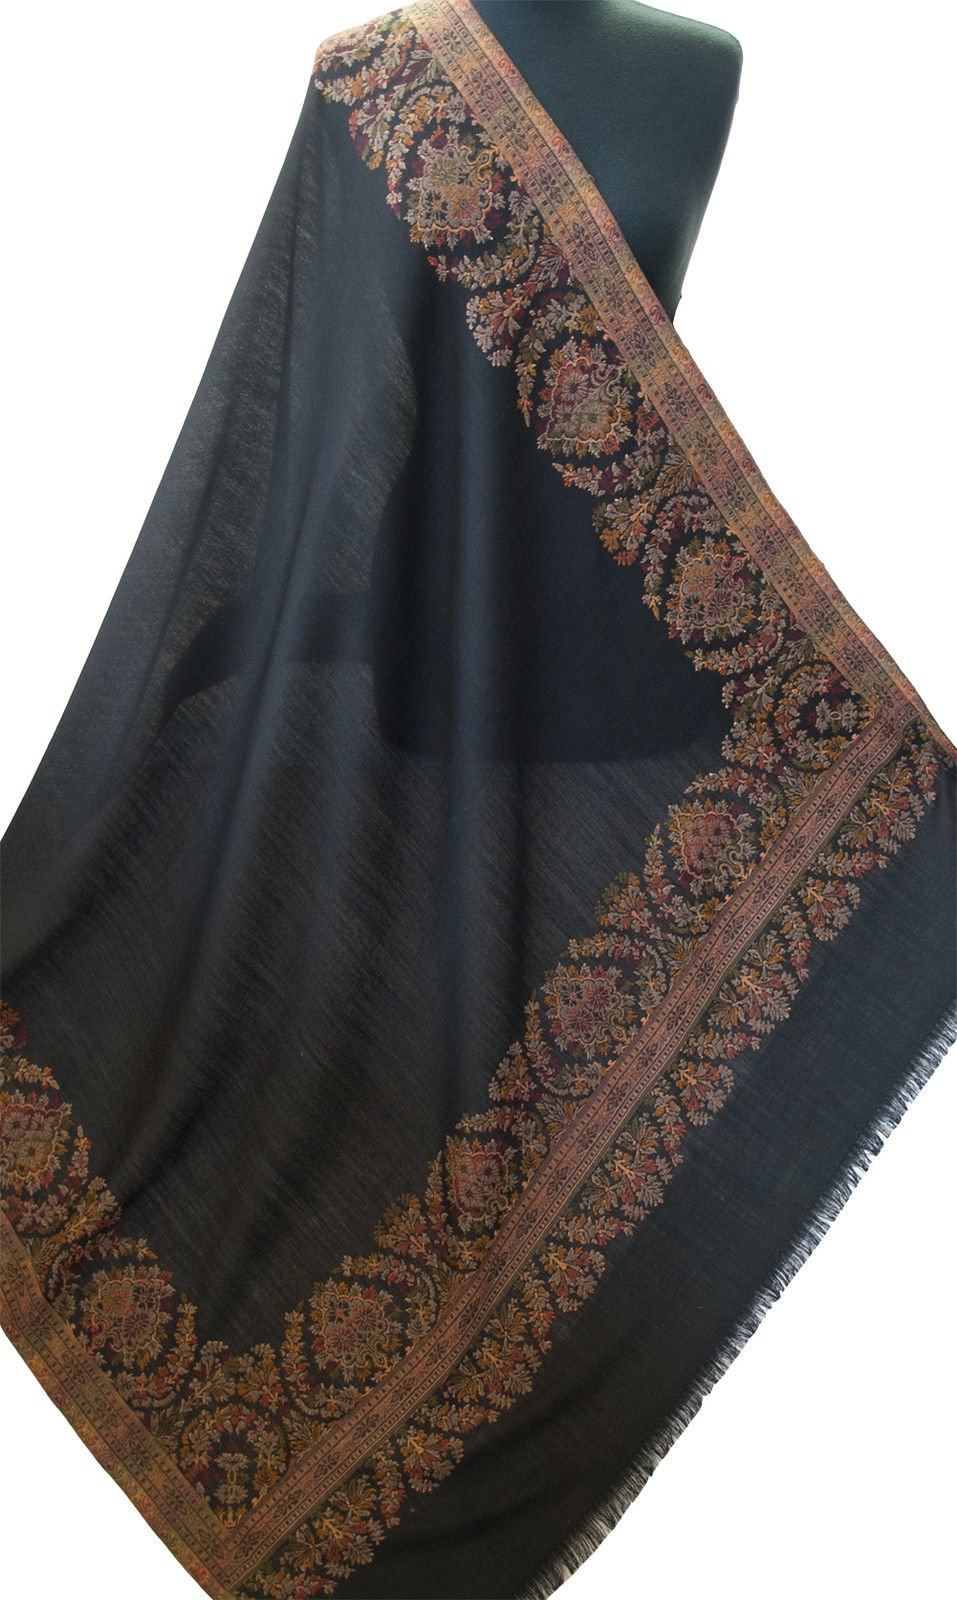 Large Black Shawl Hand-Cut Kani Jamavar Paisley Wool with Fine Details Pashmina